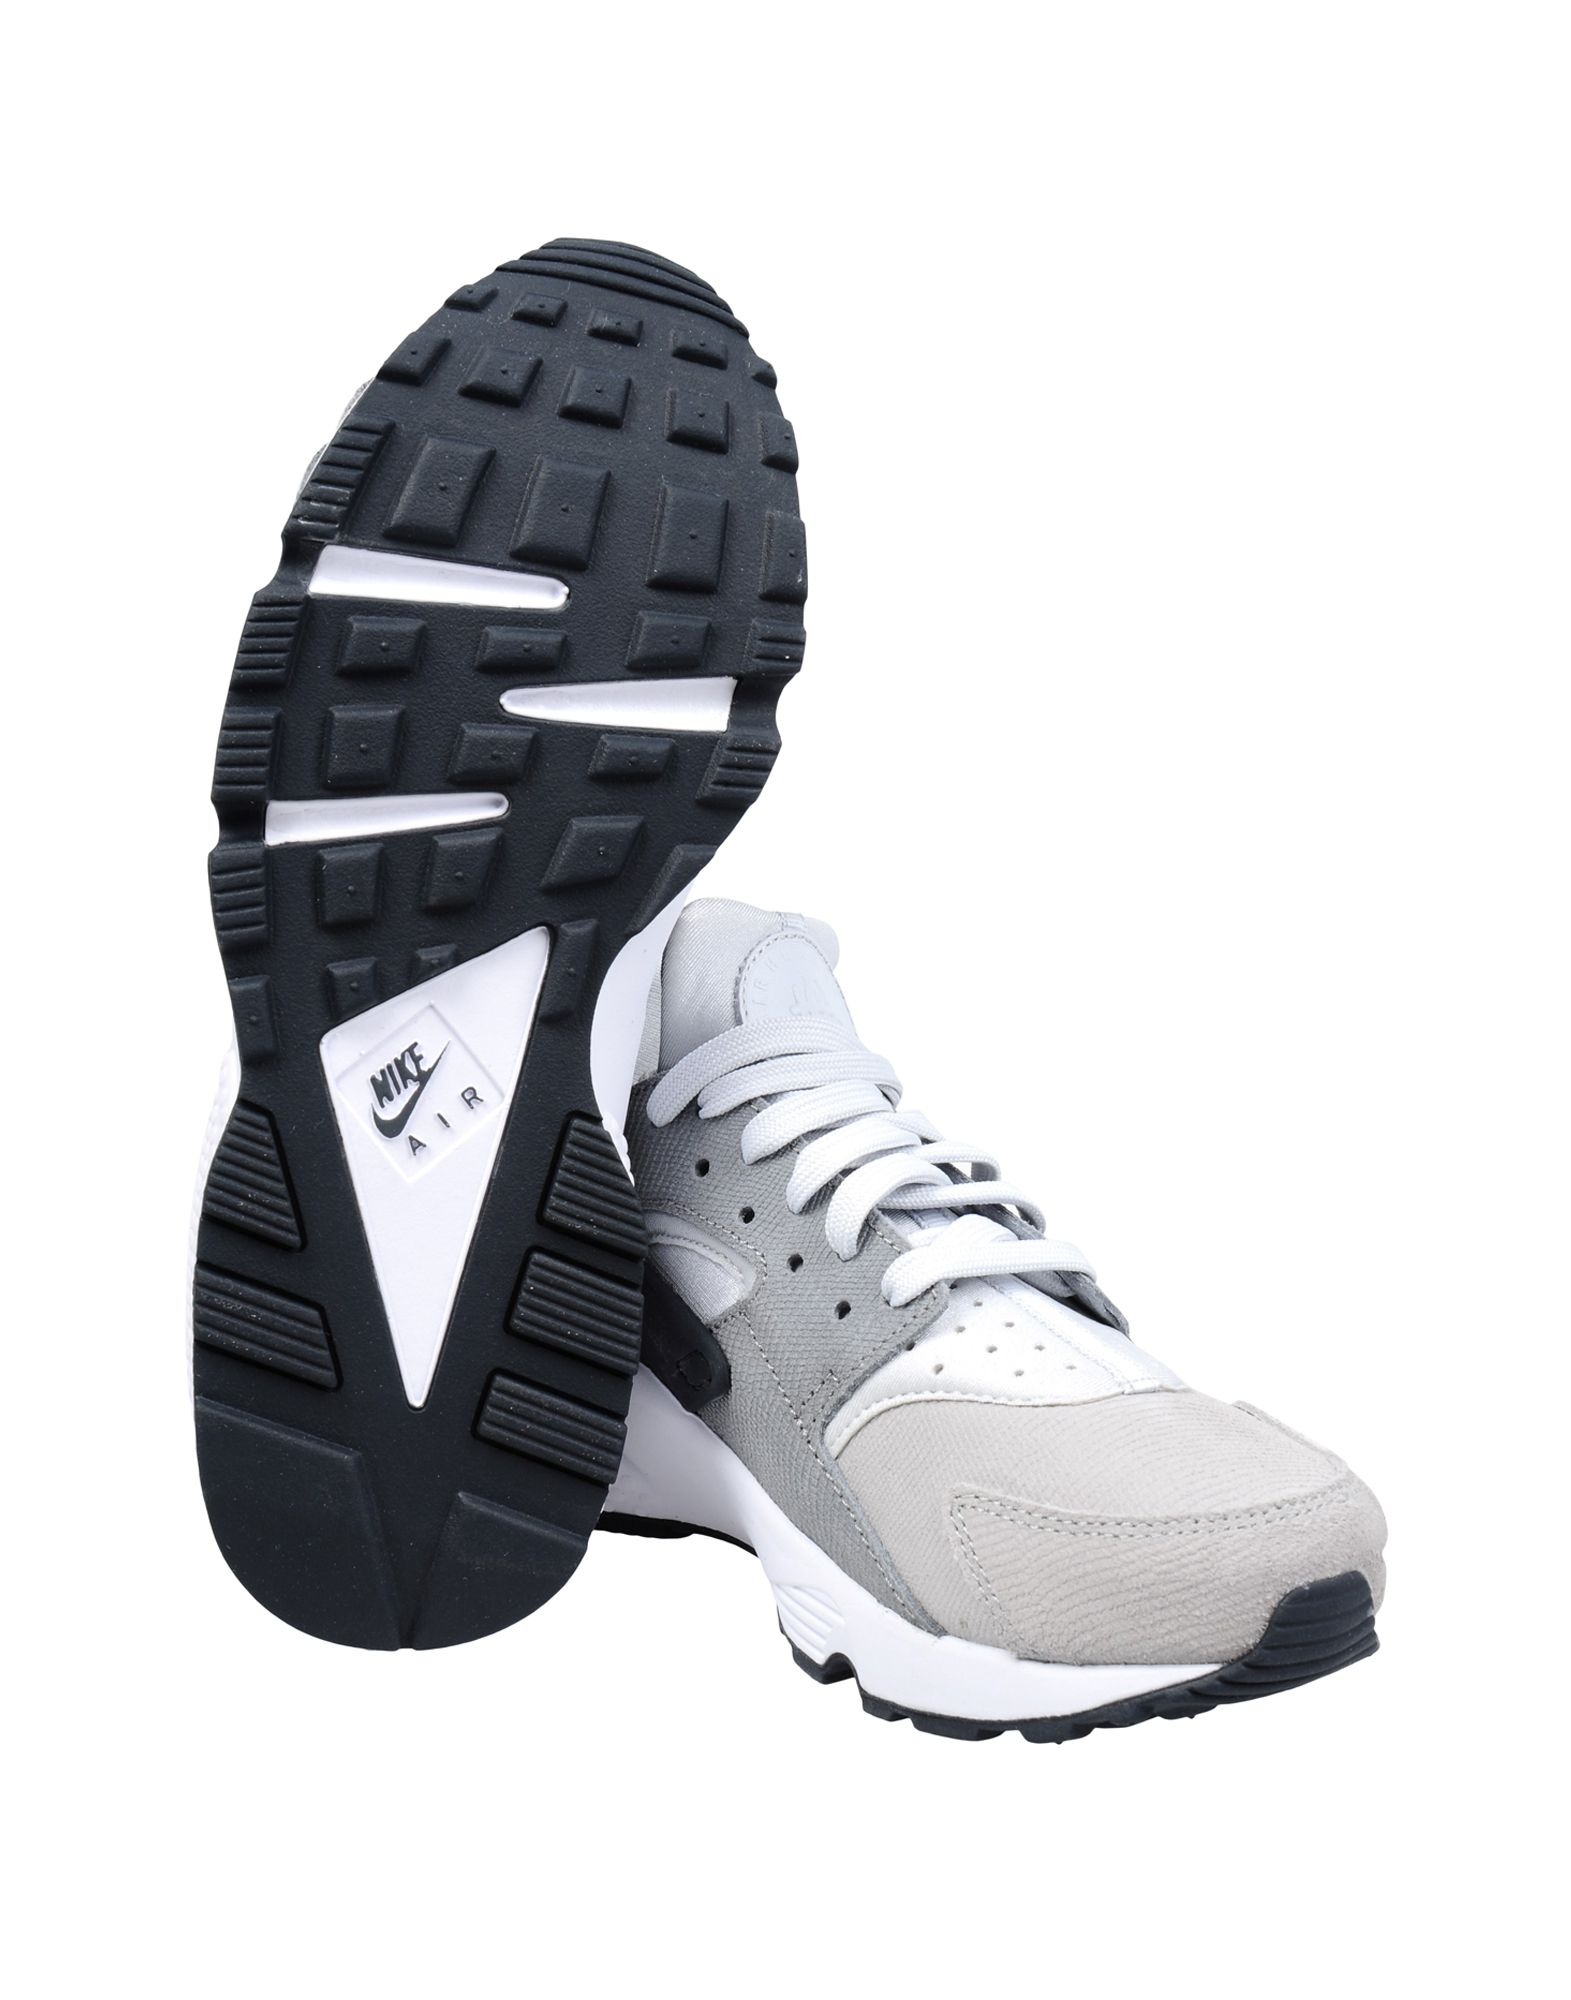 Sneakers Nike  Air Huarache Run Premium - Femme - Sneakers Nike sur